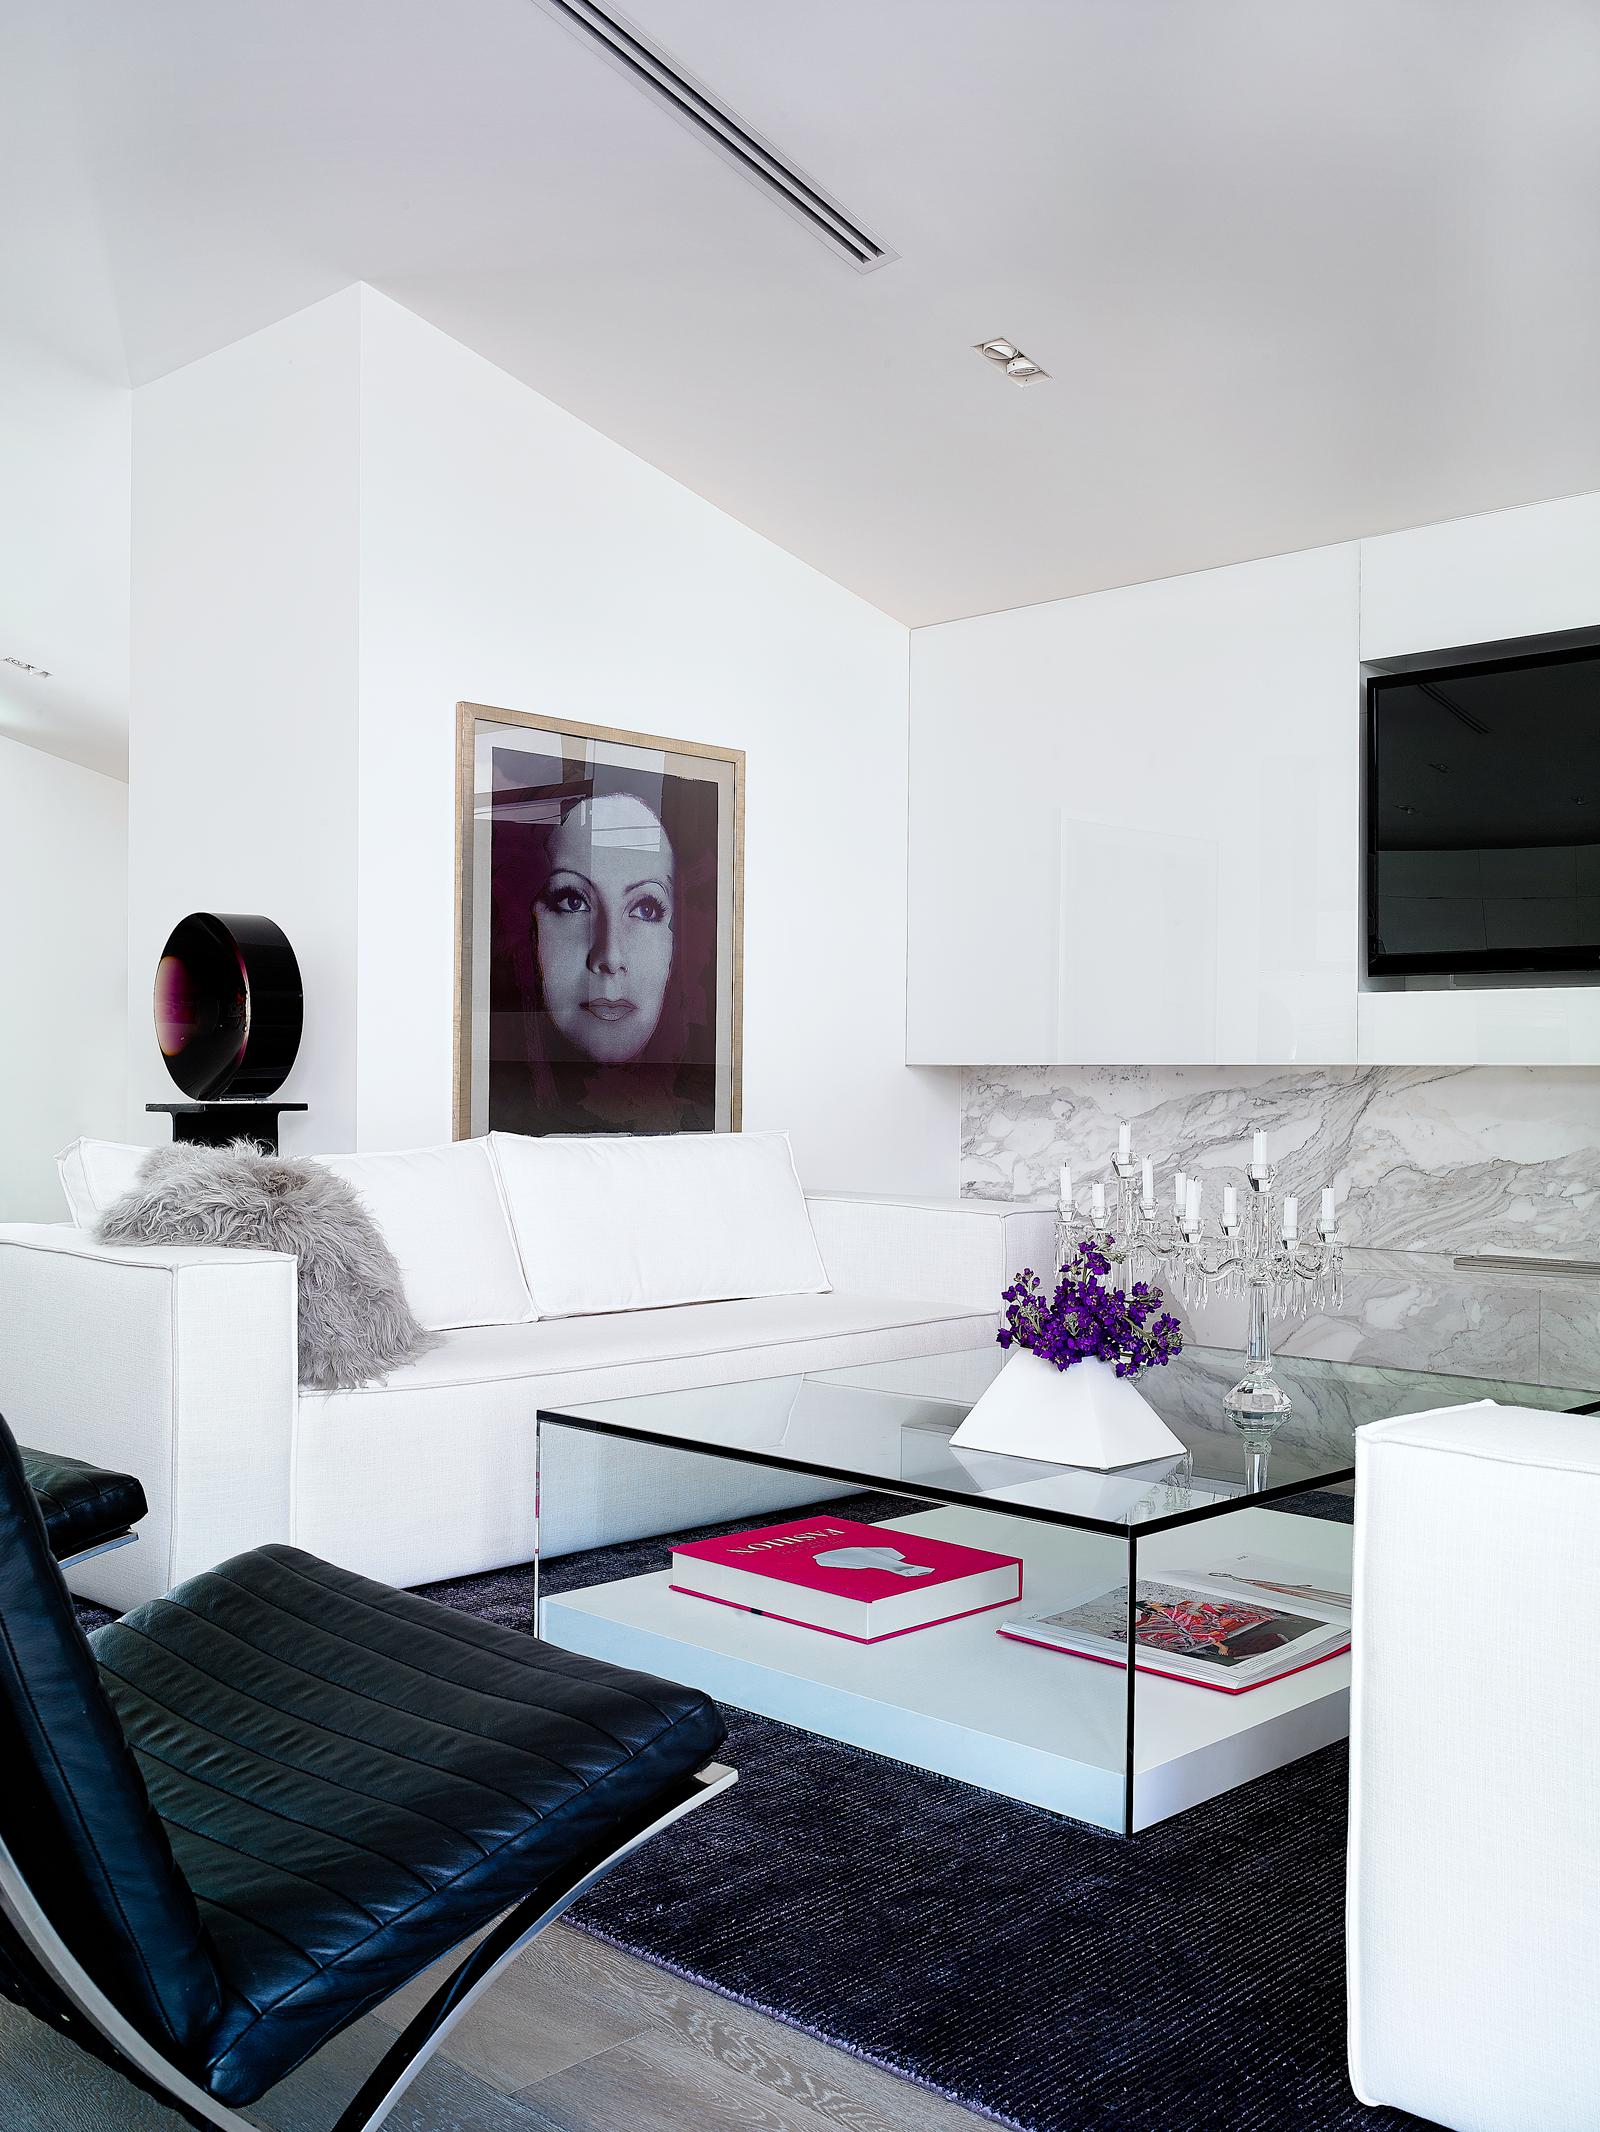 Carlos-Domenech-Brett.Giselle25206--B&G-Design---May-18-2014--0422132.png